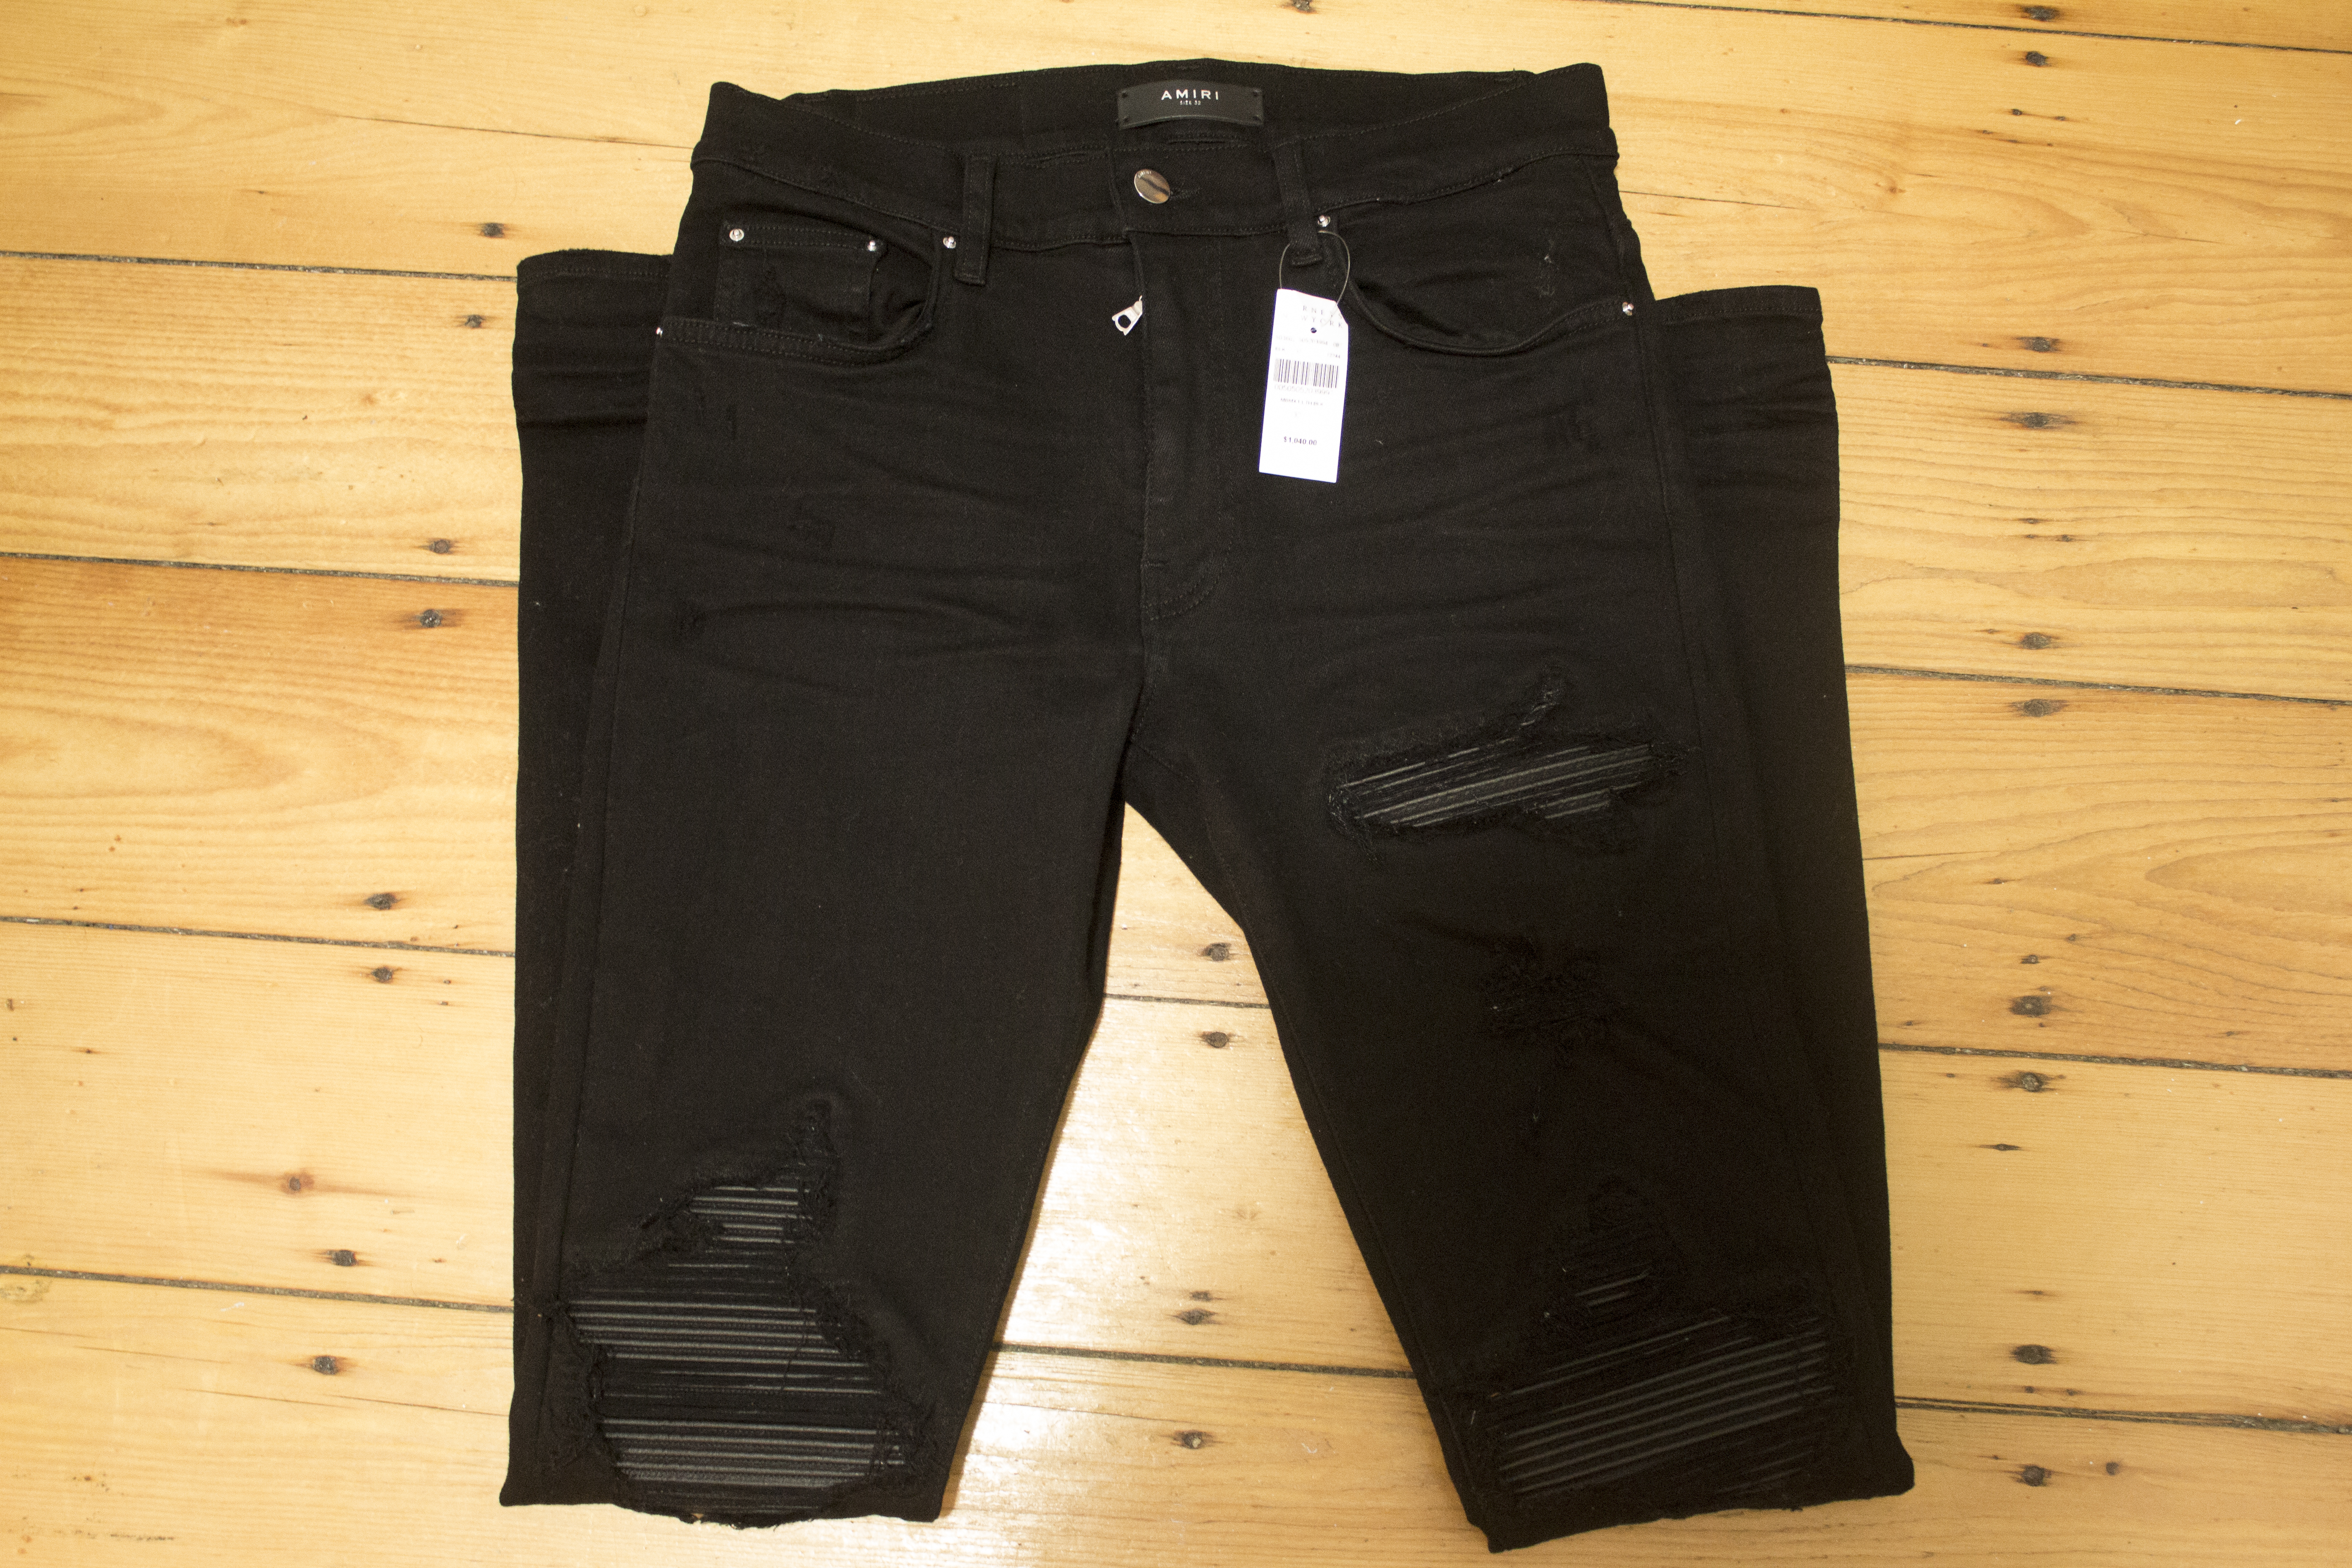 d1e1a31f2fe670 Amiri Amiri Mx1 Leather-inset Slim Jeans Size 32 | Grailed